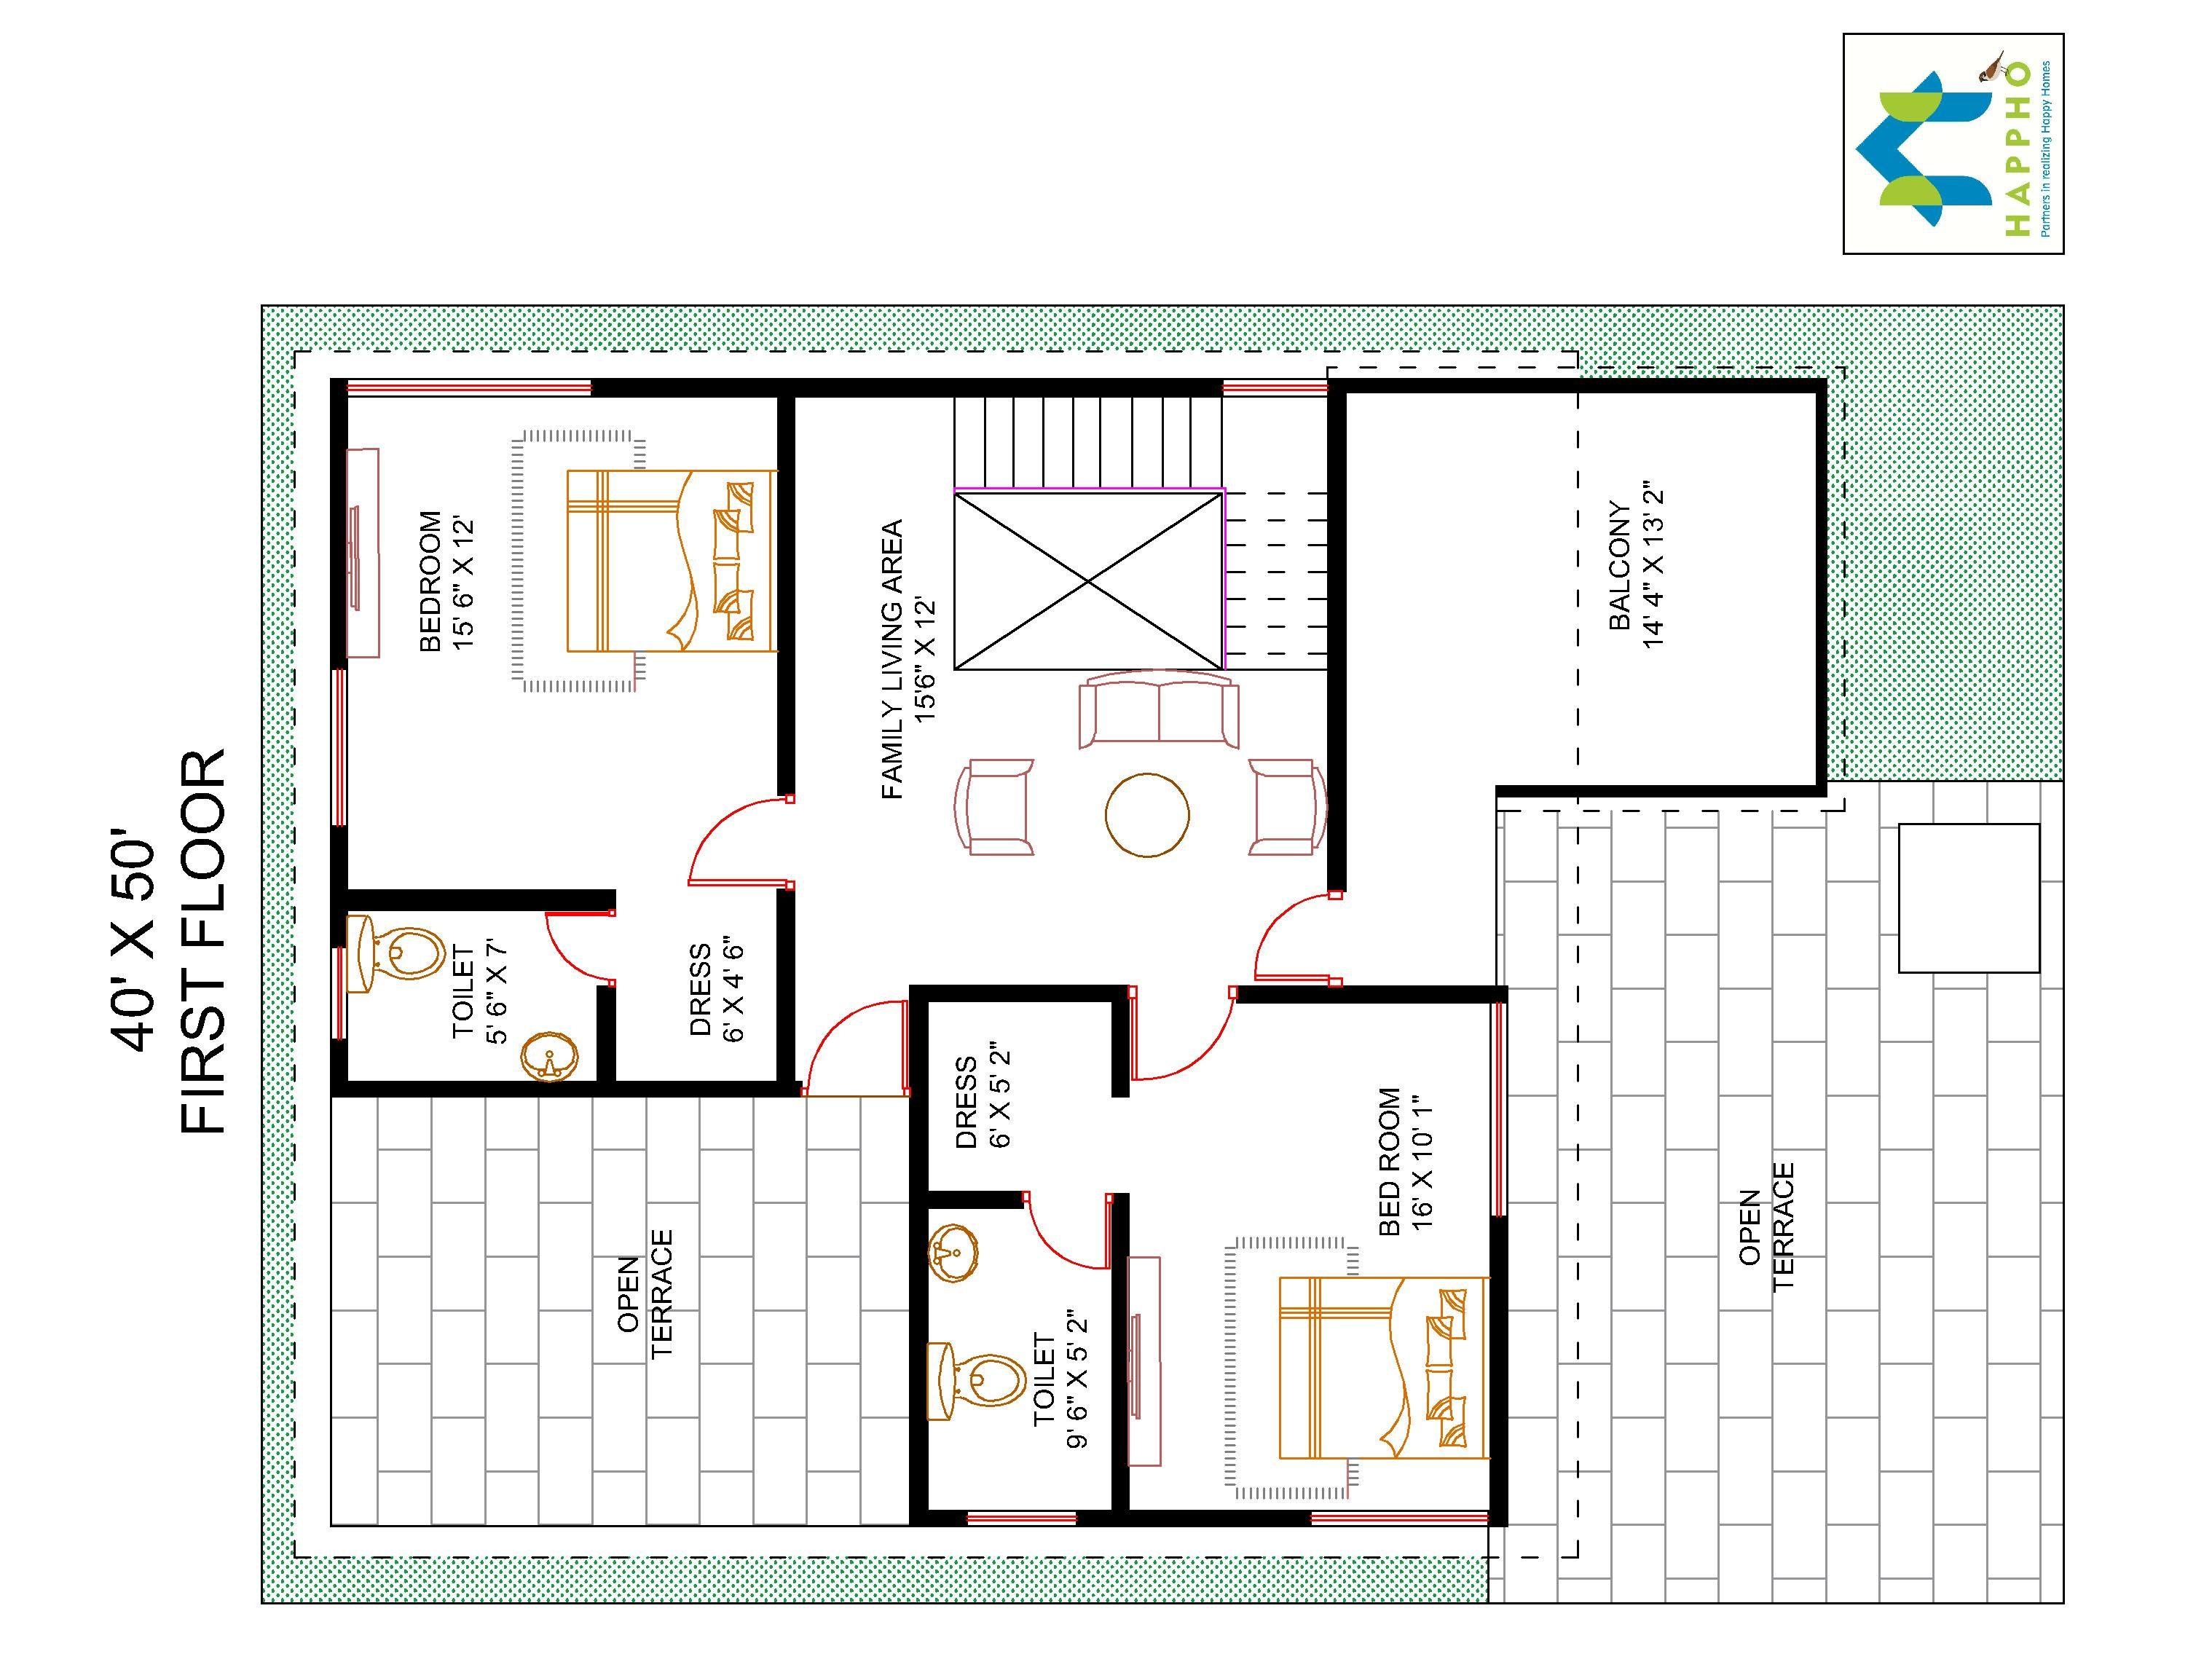 4 Bhk Floor Plan For 40 X 50 Plot 2000 Square Feet 222